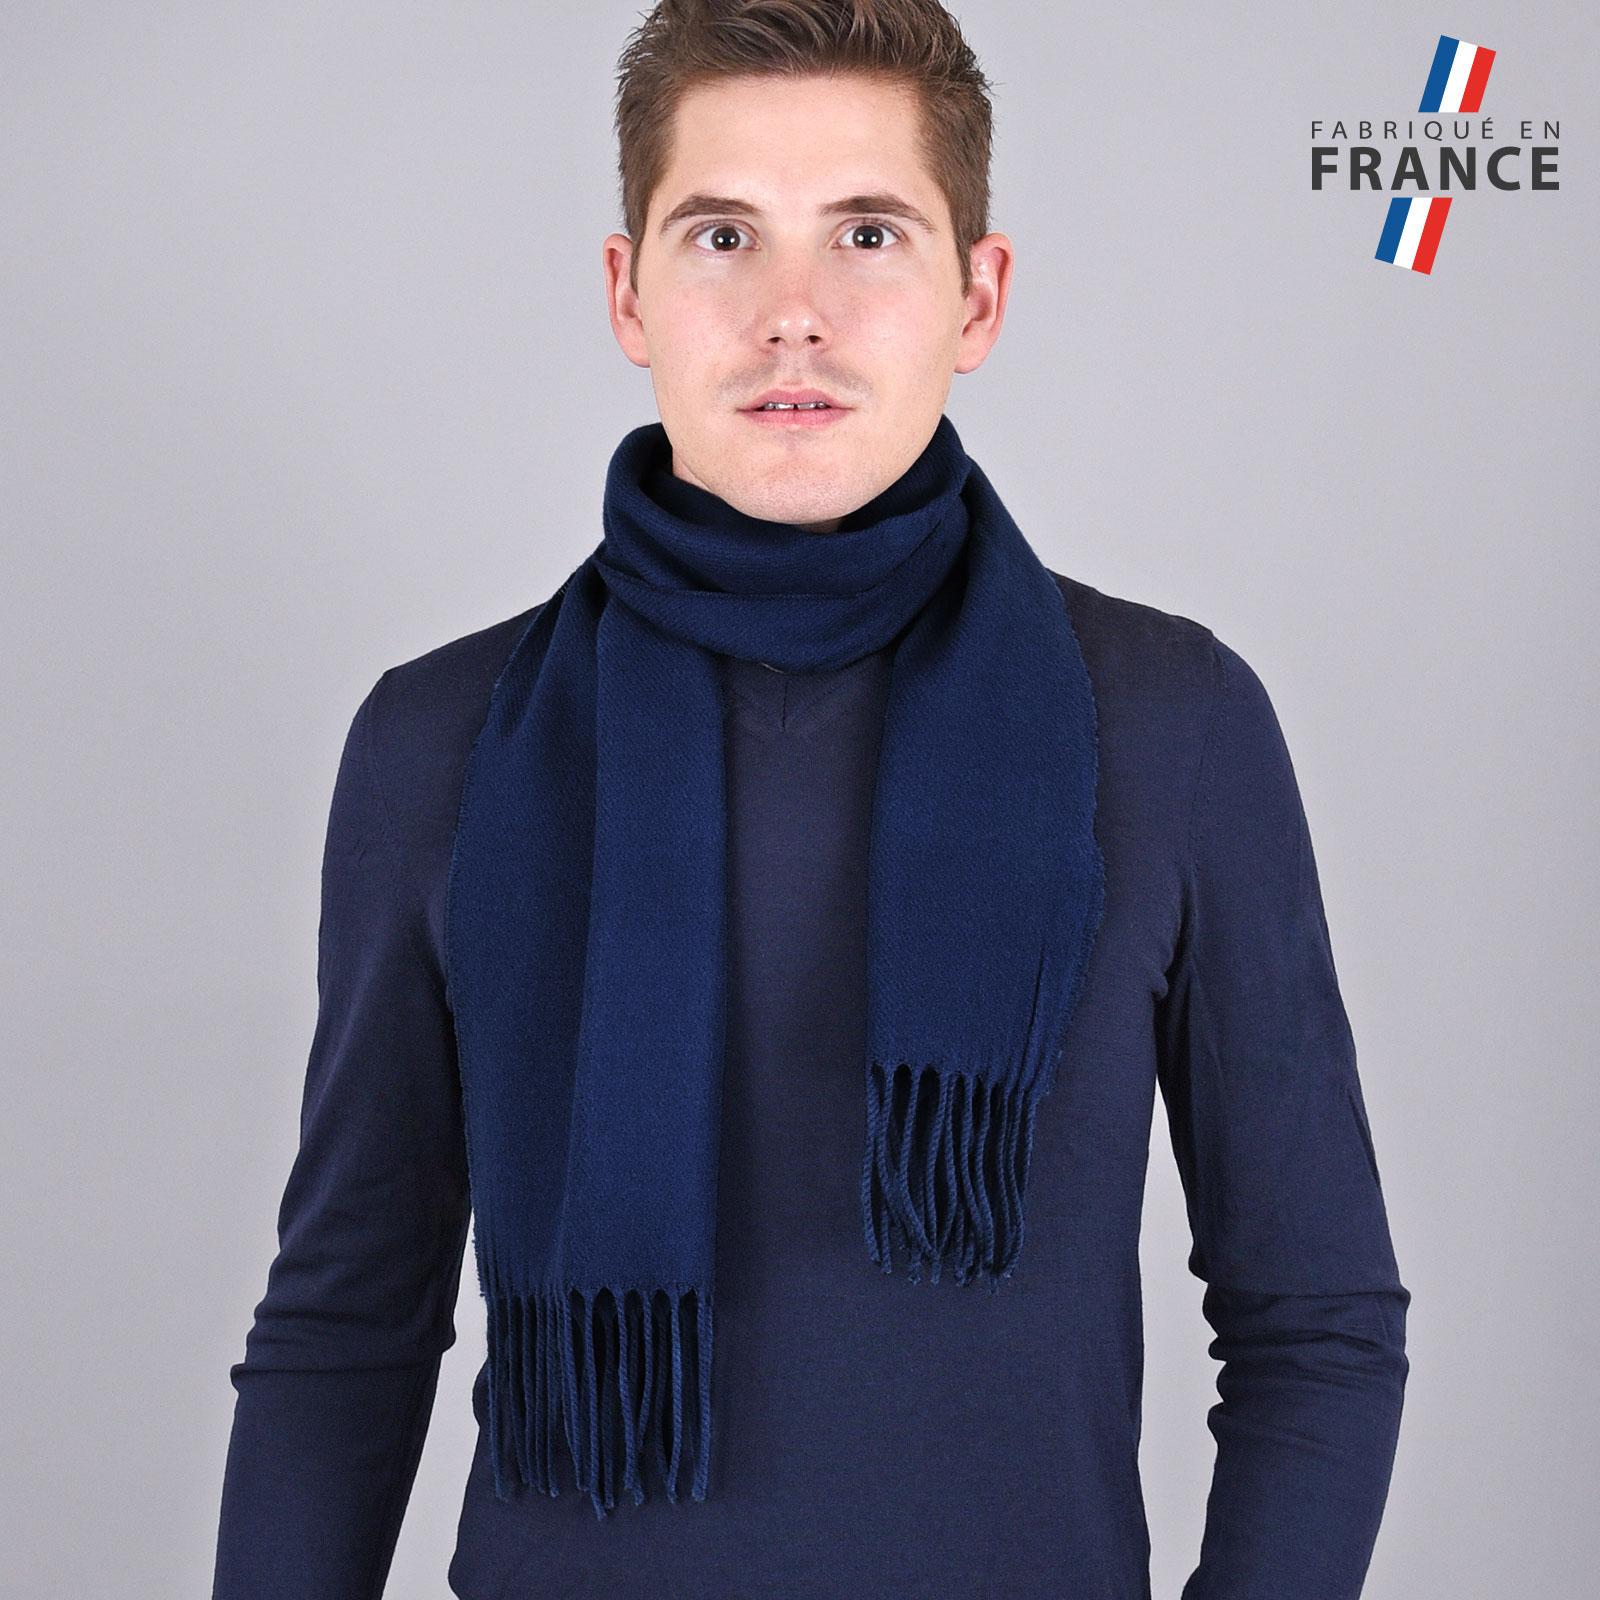 AT-03233-VH16-LB_FR-echarpe-homme-a-franges-bleue-fabrication-francaise